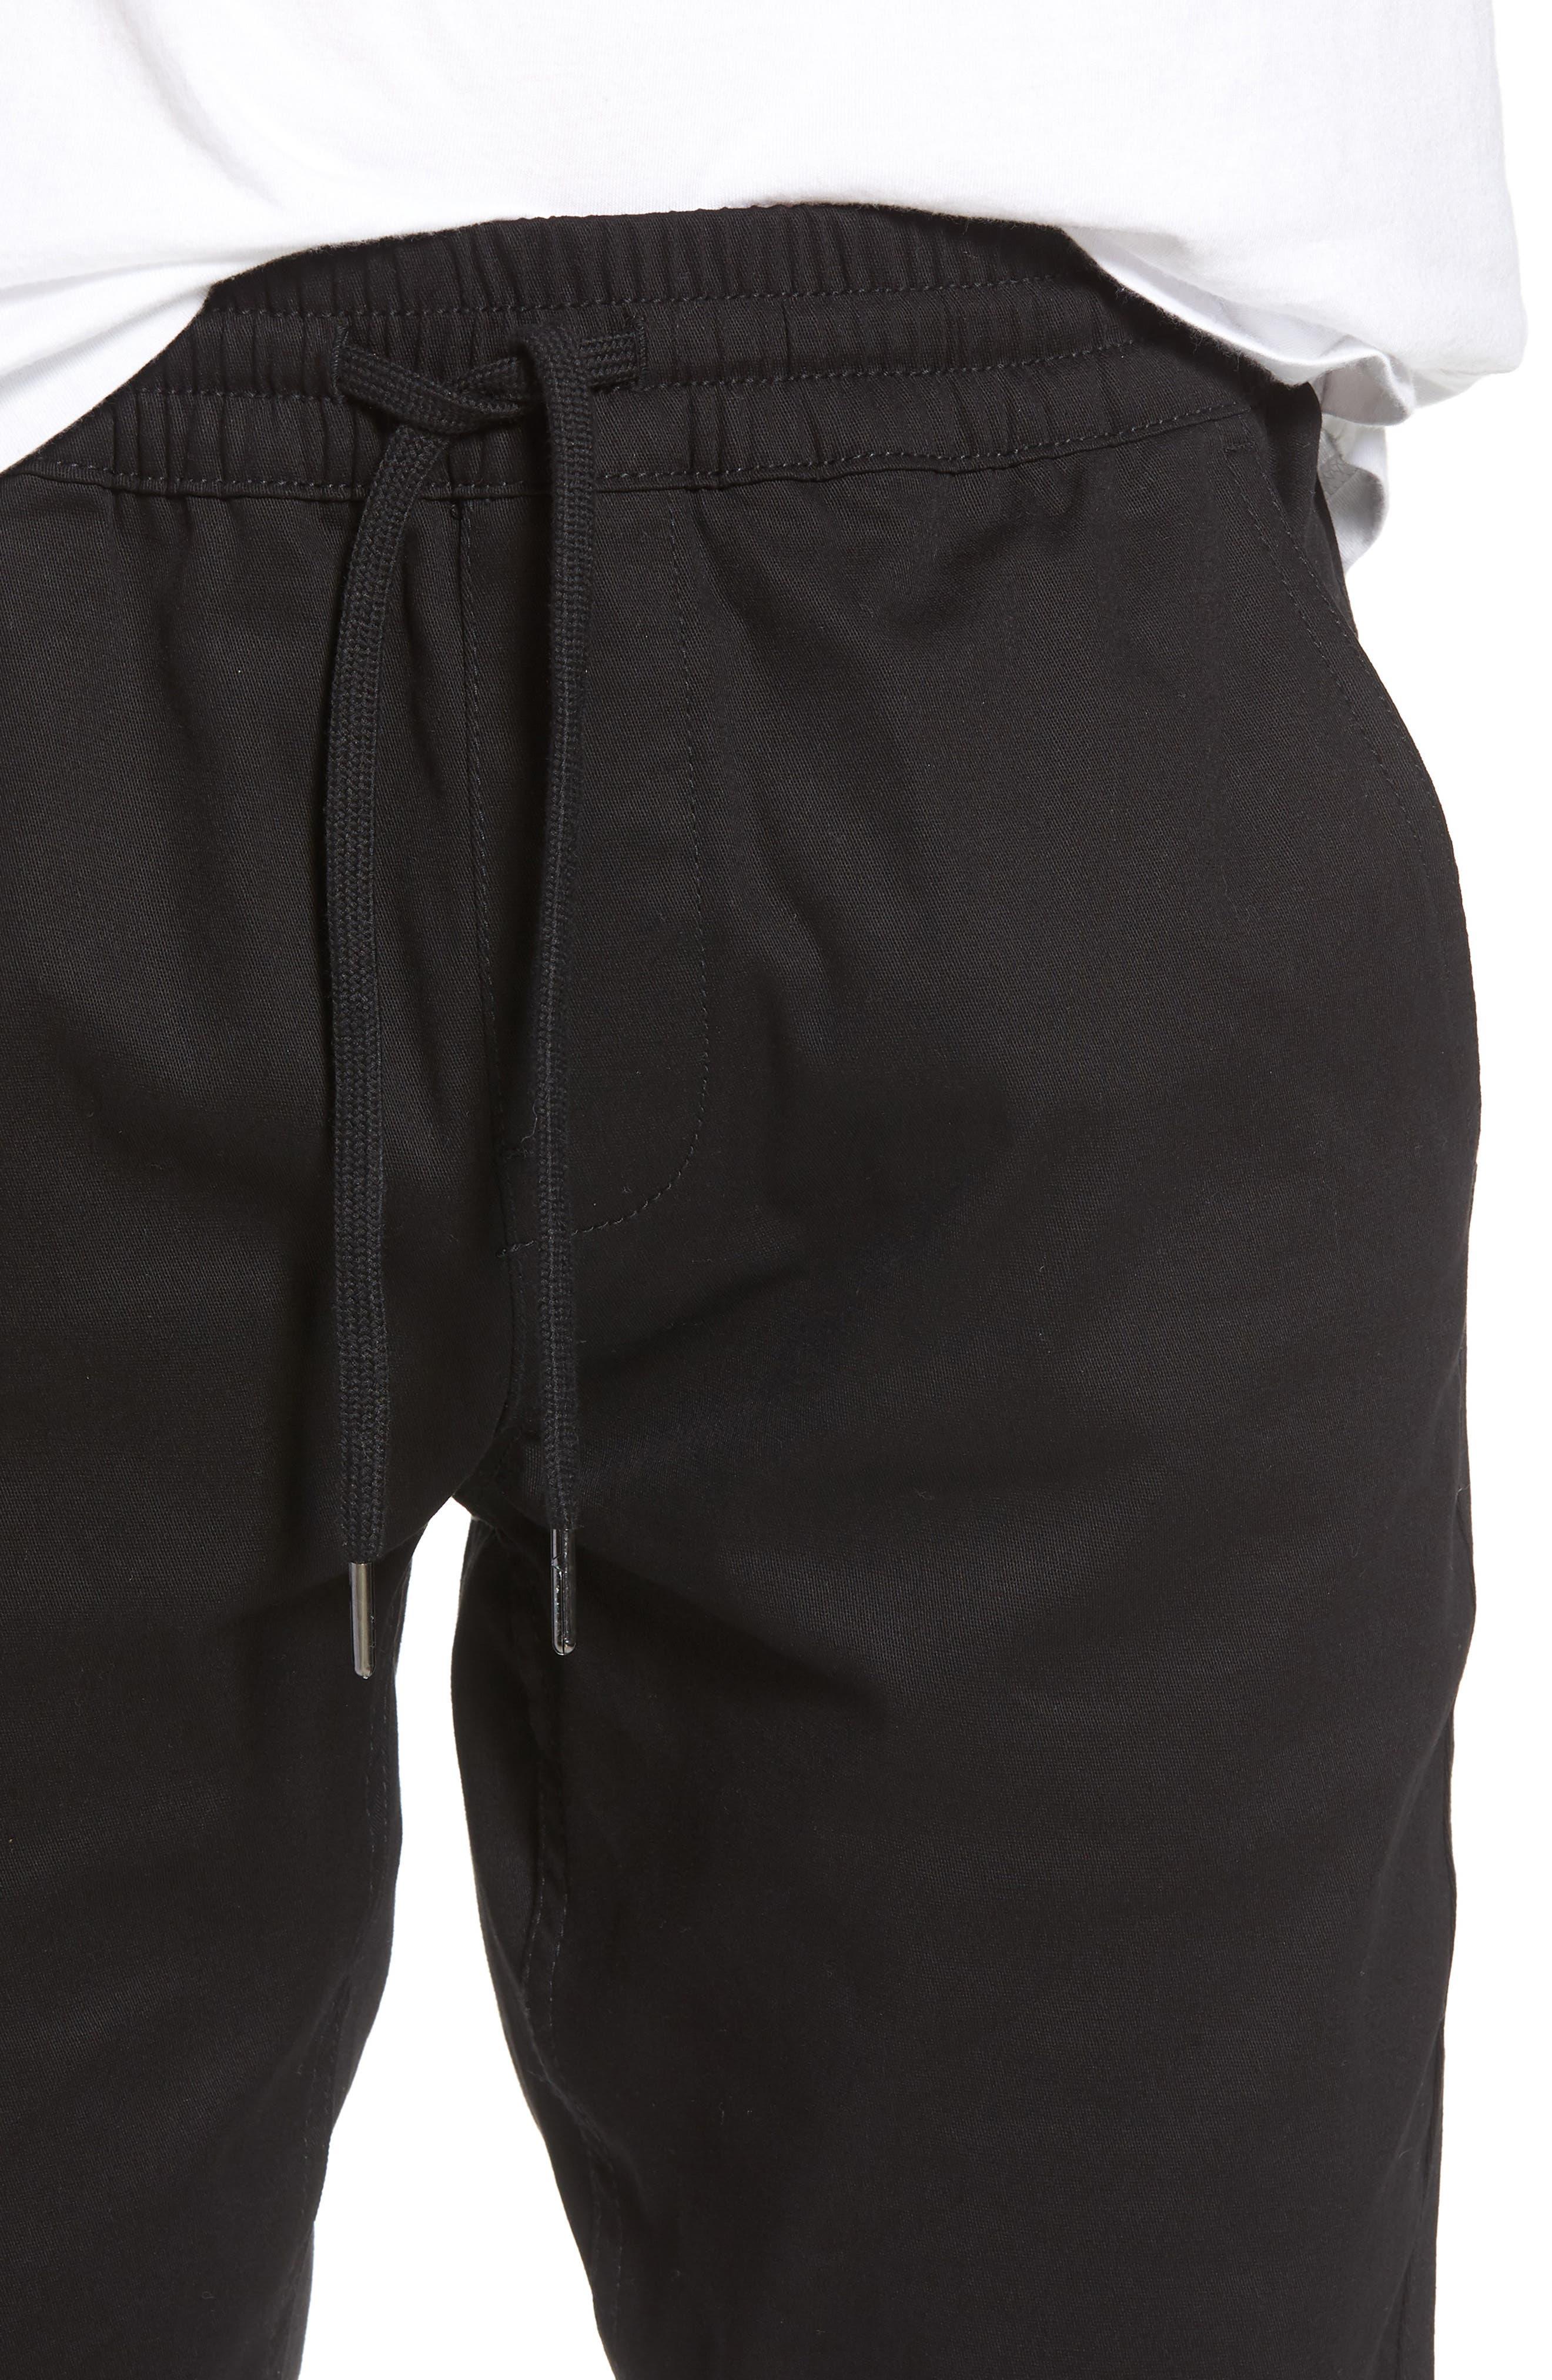 Runner Slim Fit Jogger Pants,                             Alternate thumbnail 4, color,                             Black